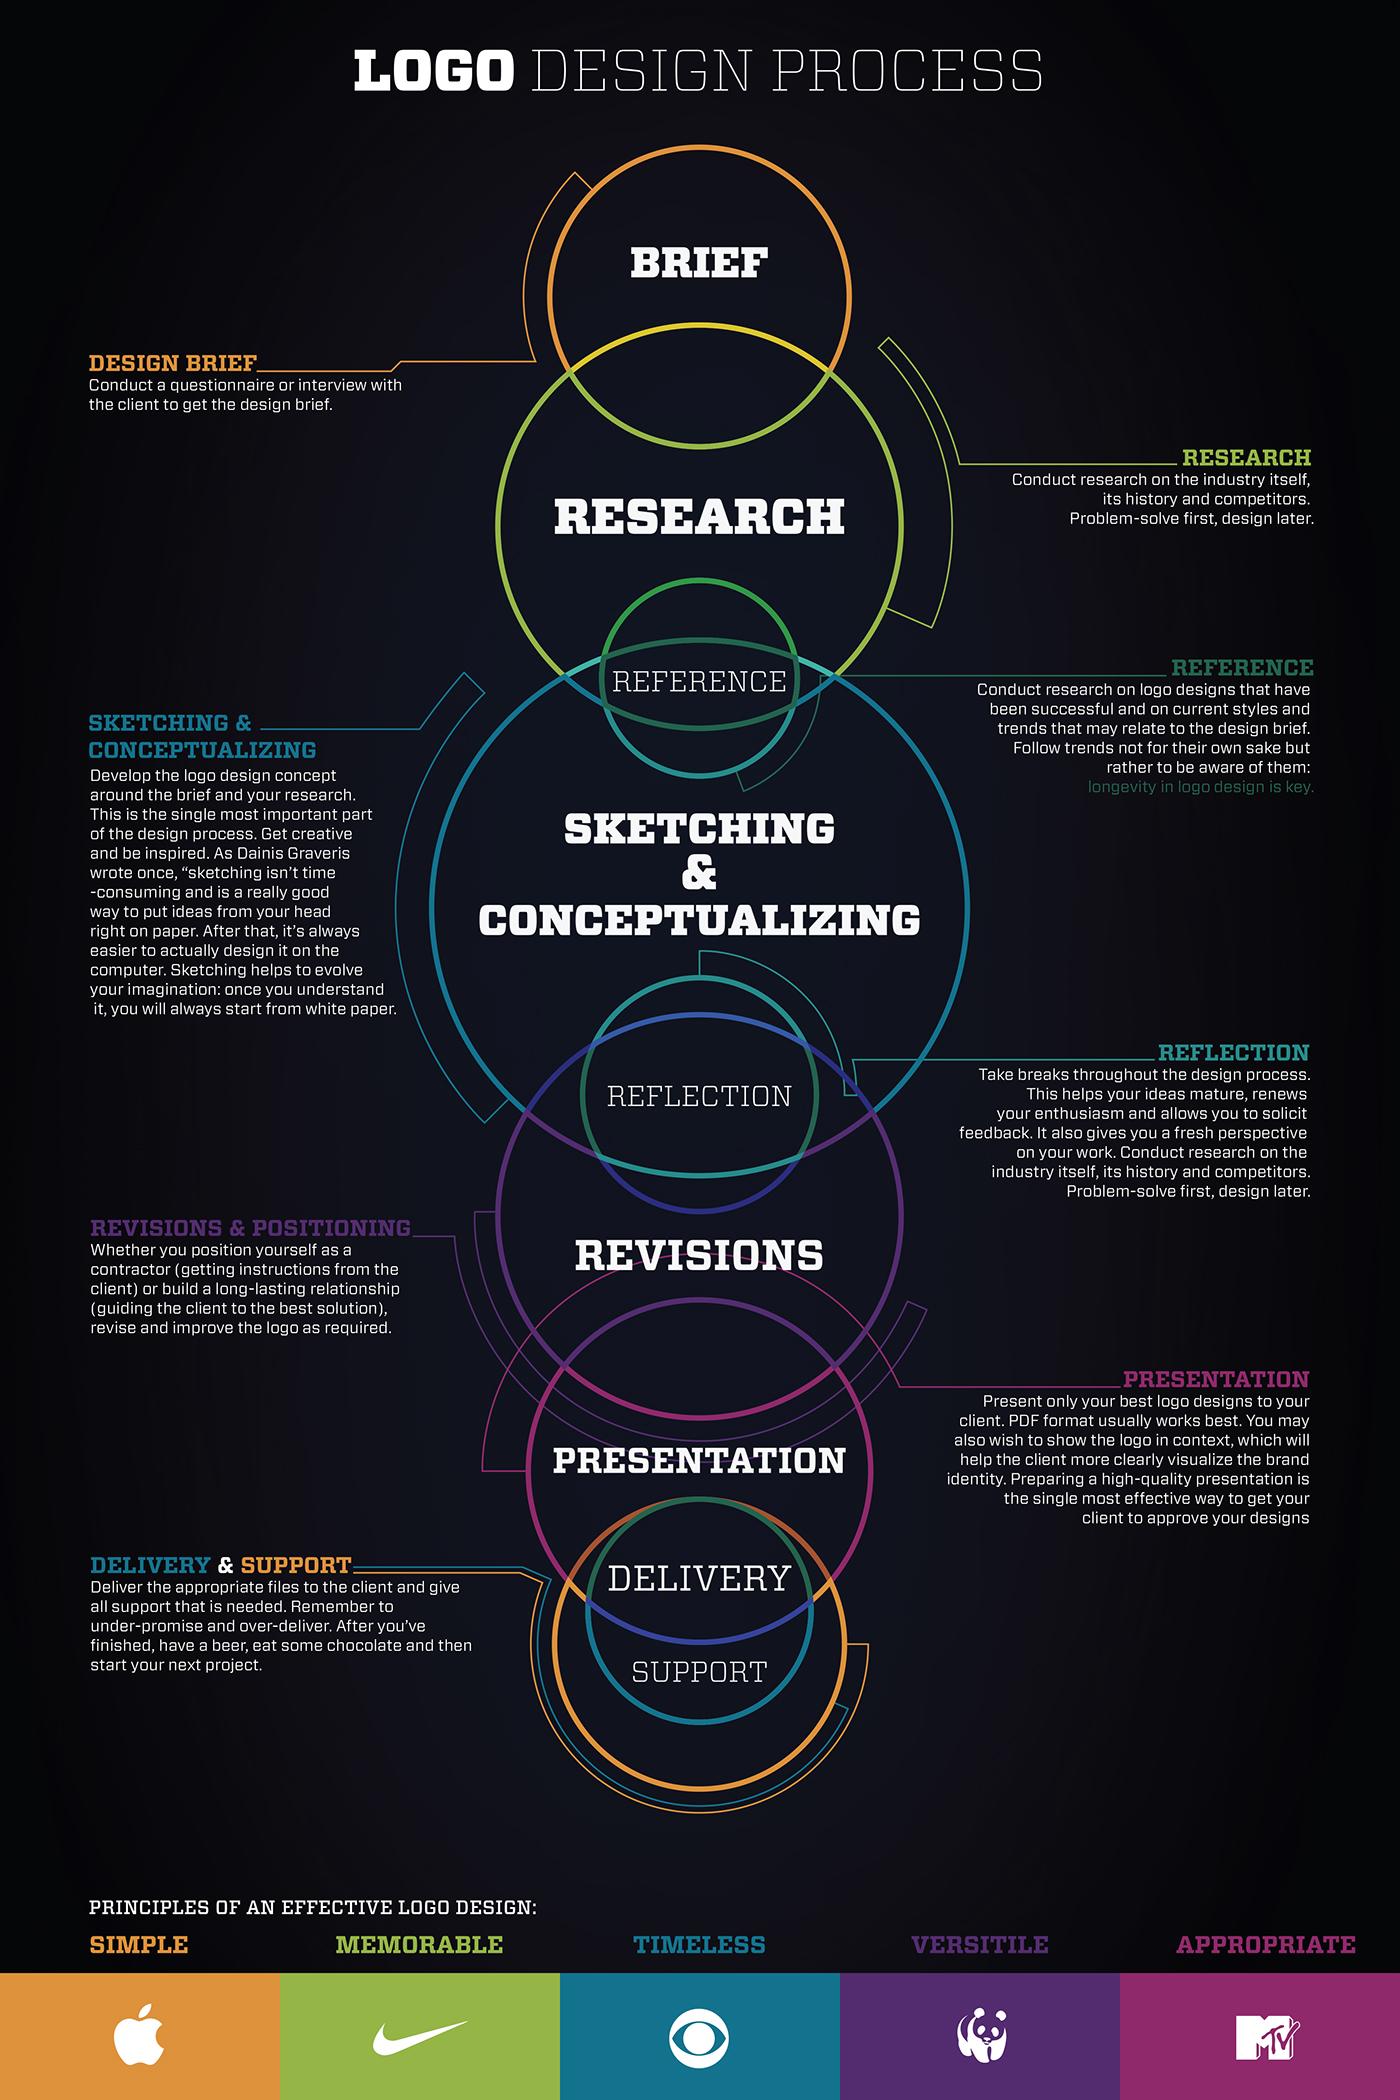 Logo Design Process Infographic On Behance